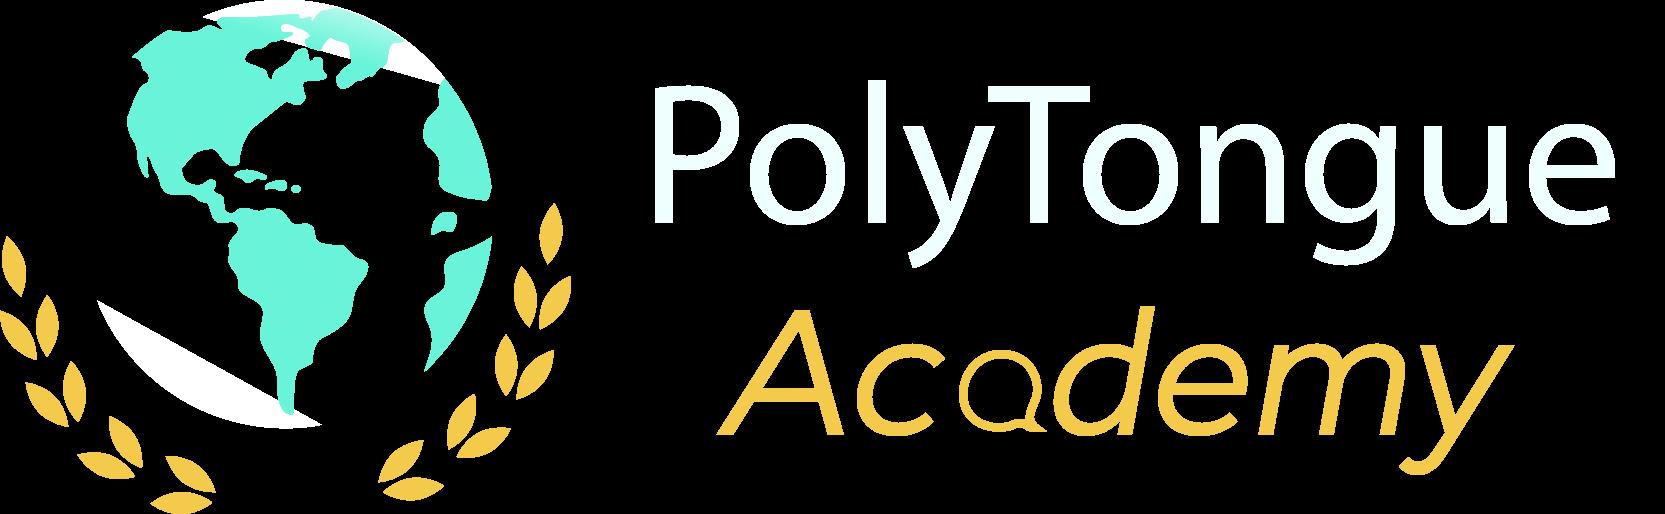 Polytongue Academy